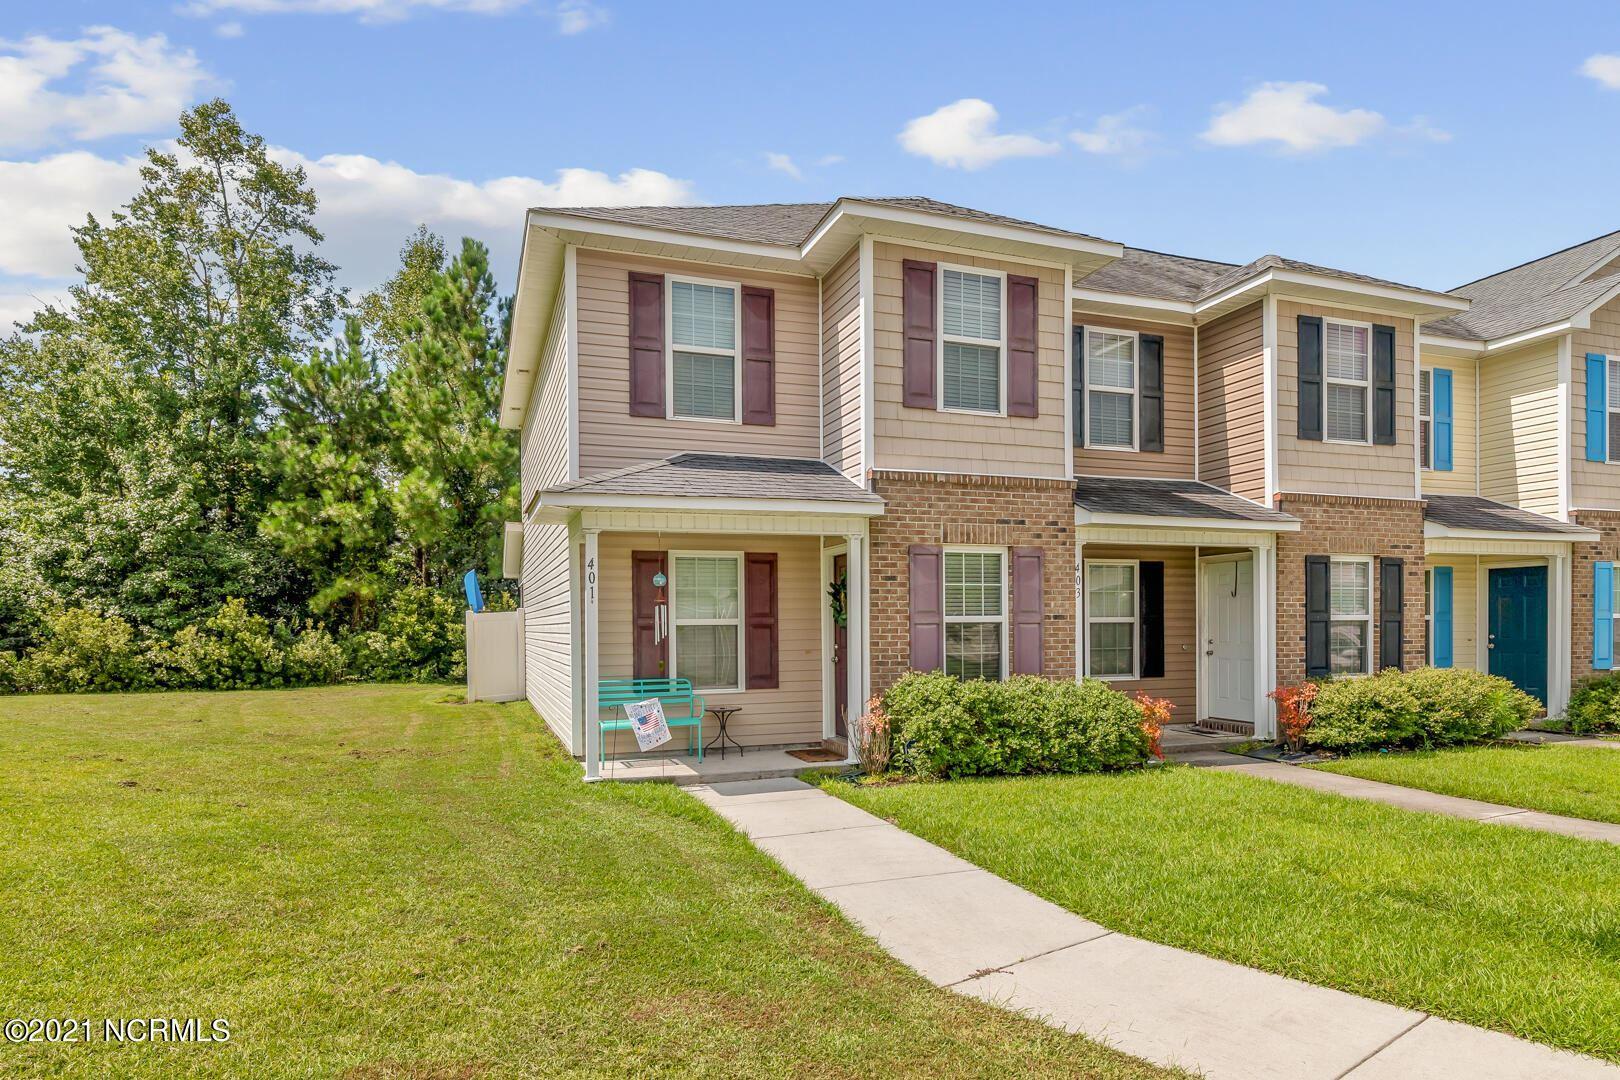 Photo of 401 Falls Cove, Jacksonville, NC 28546 (MLS # 100287569)